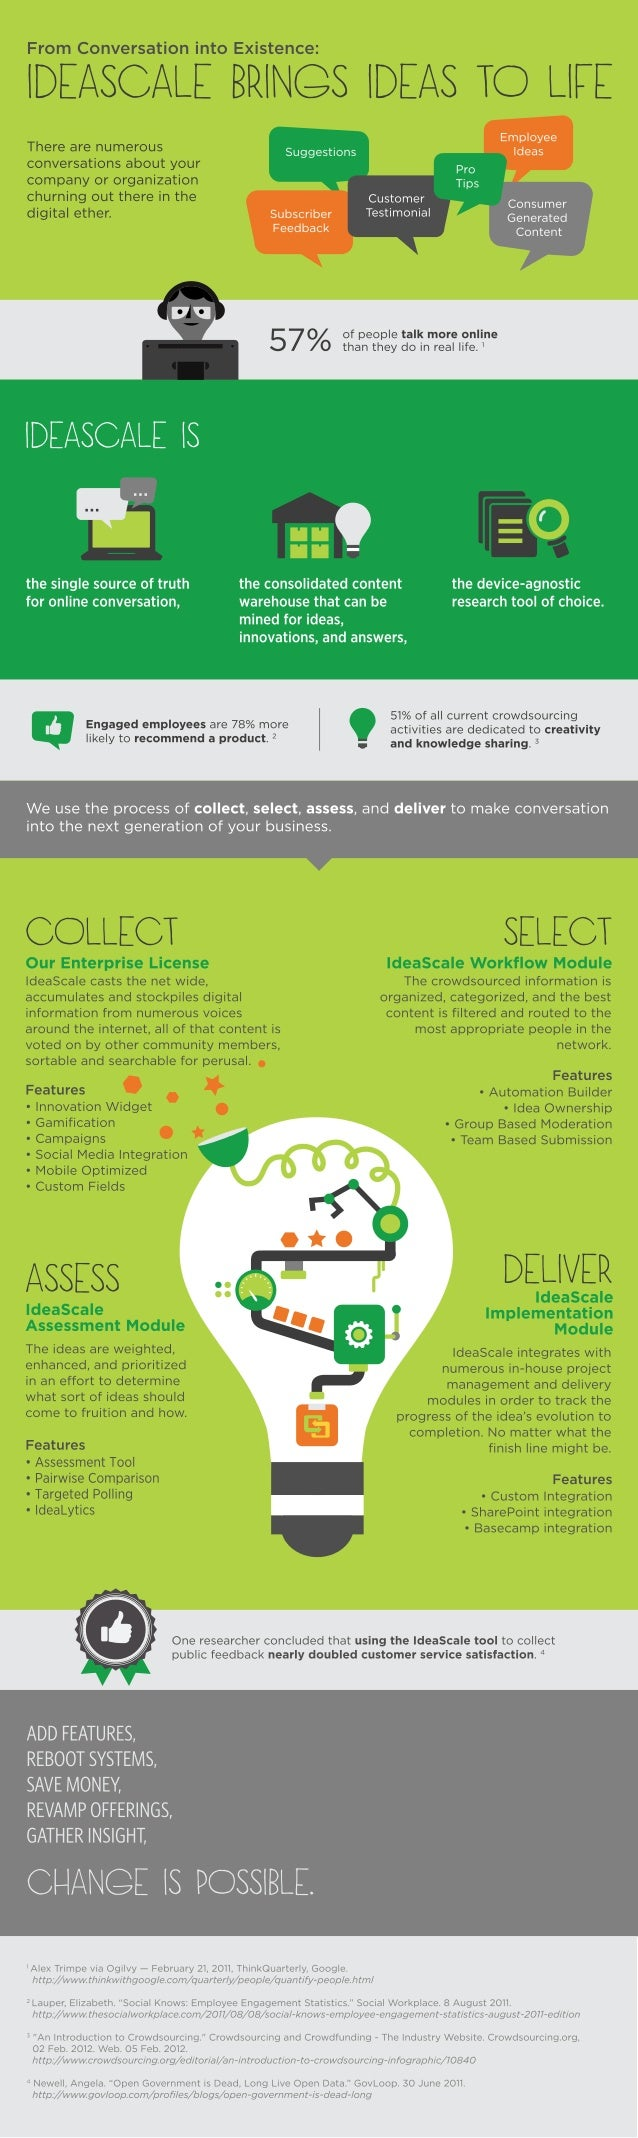 IdeaScale Innovation Methodology